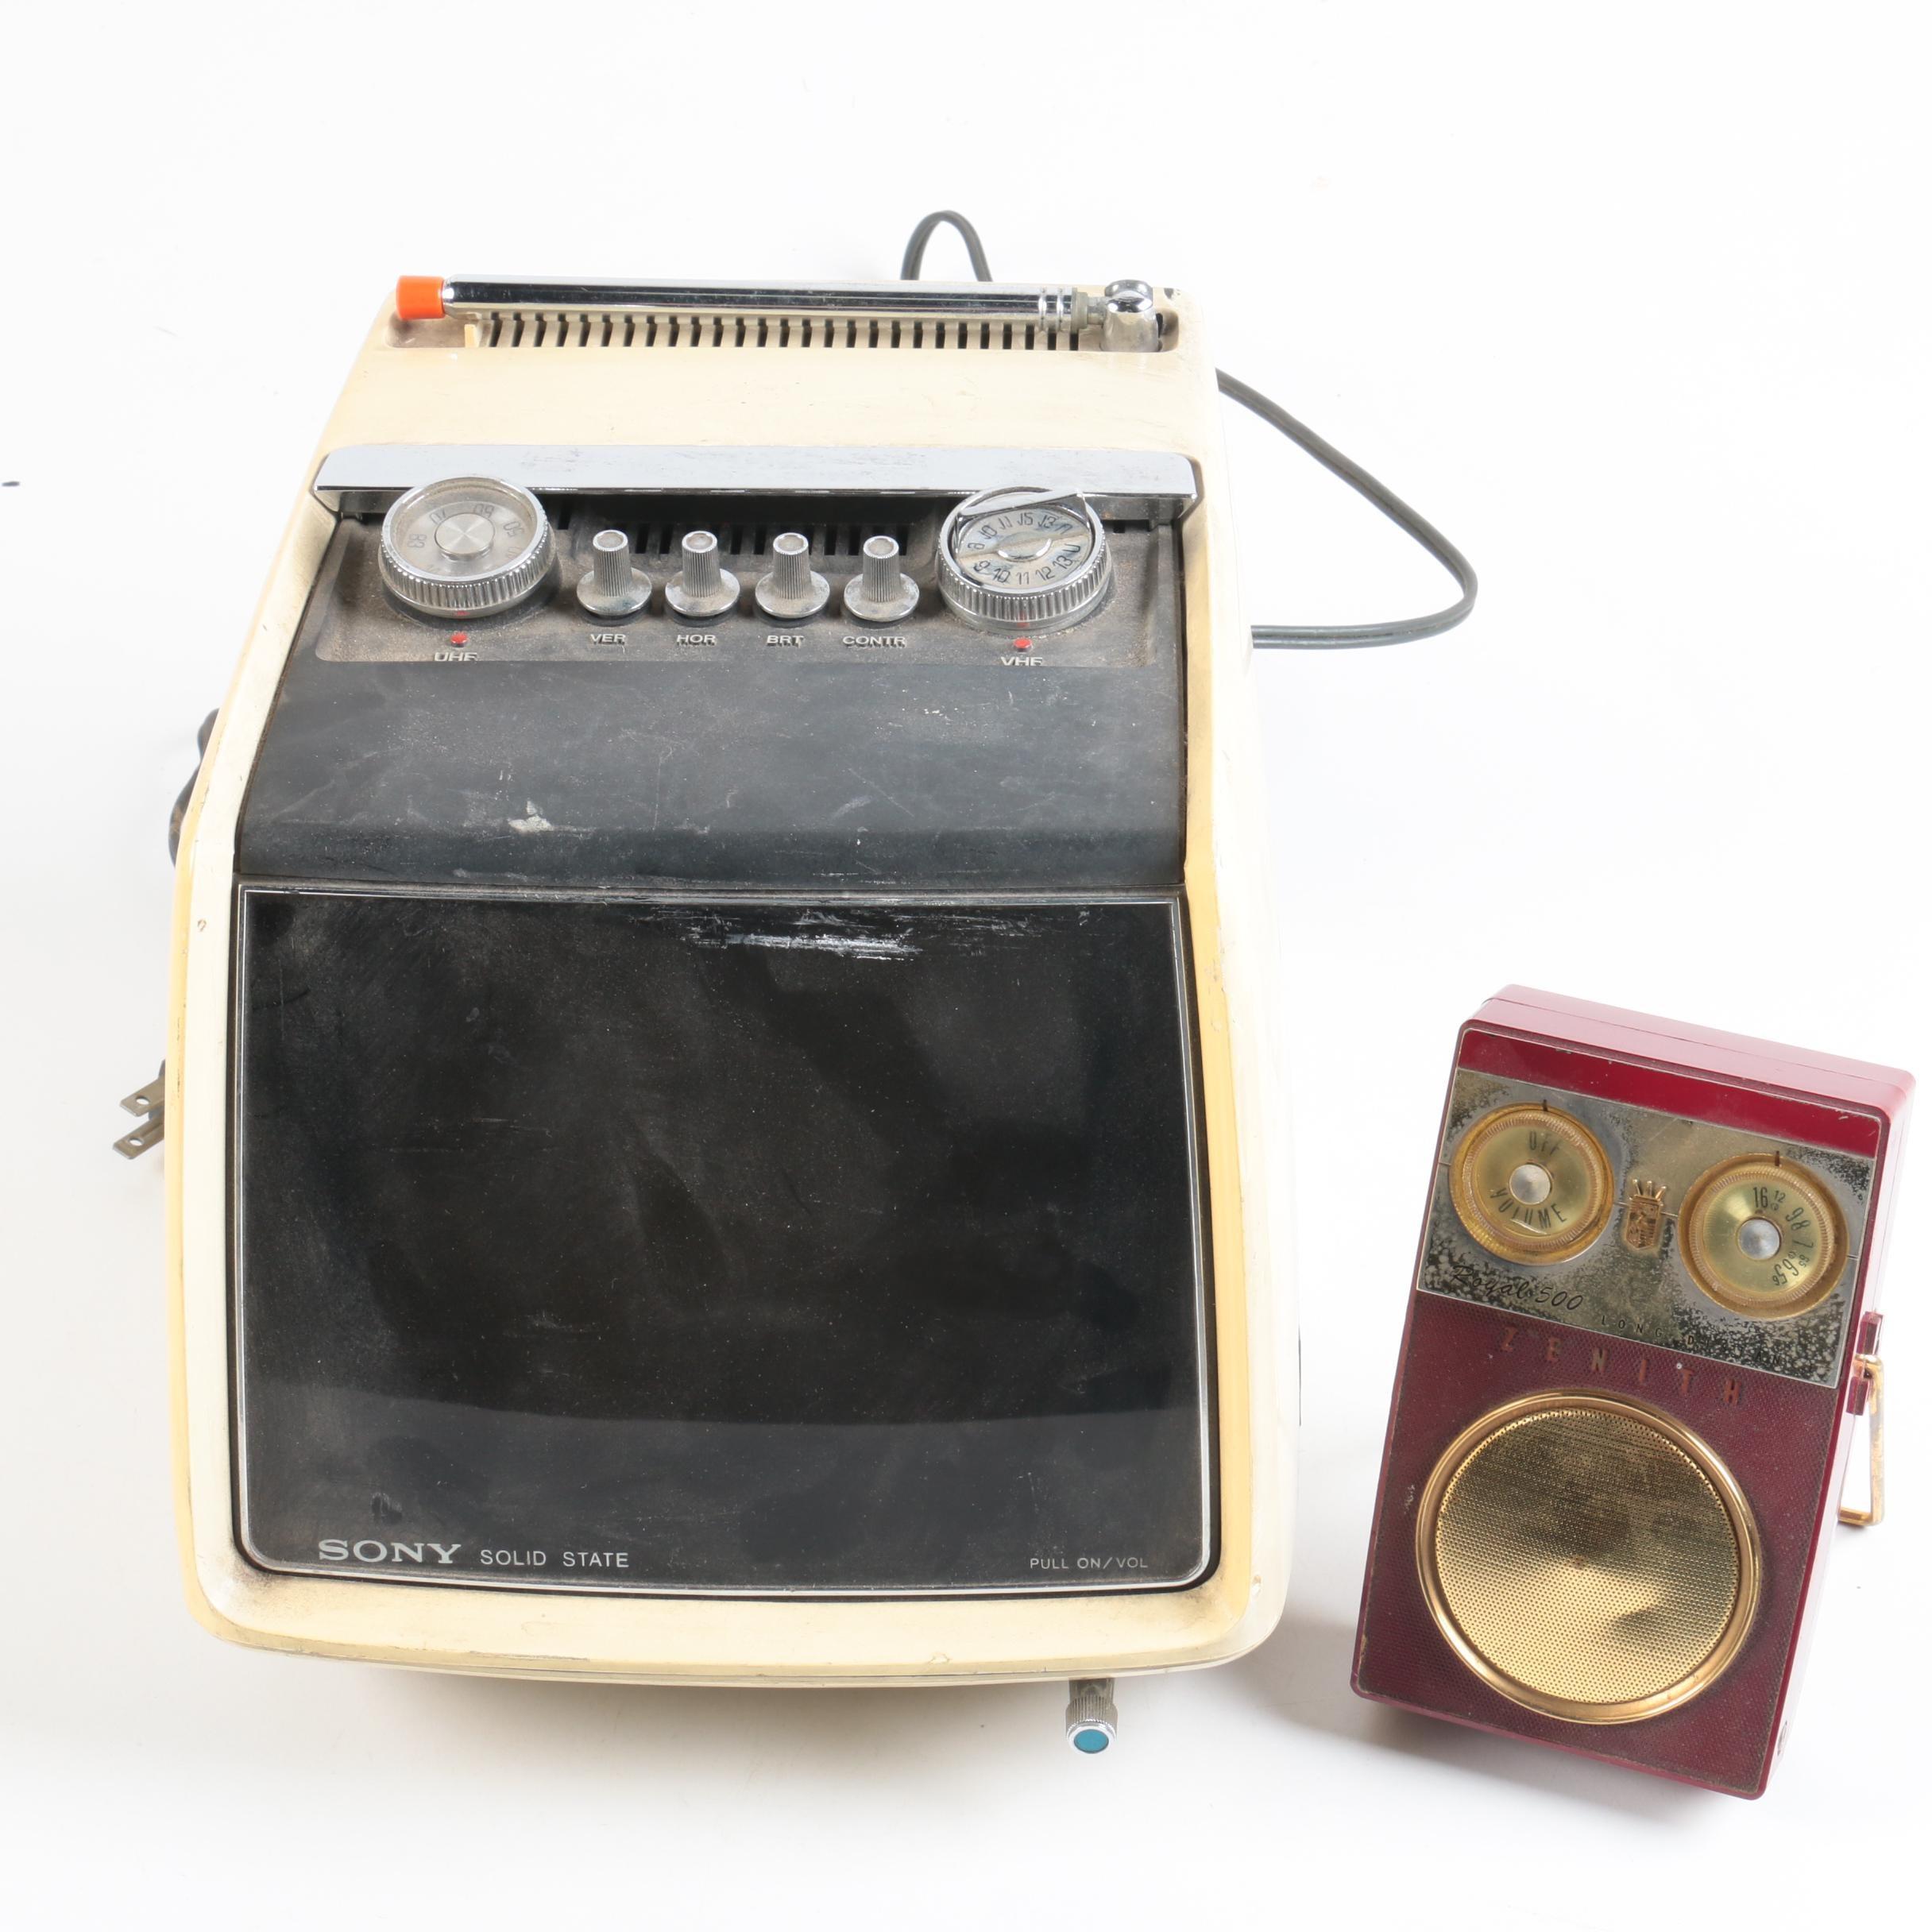 Vintage Sony Portable TV and Zenith Transistor Radio